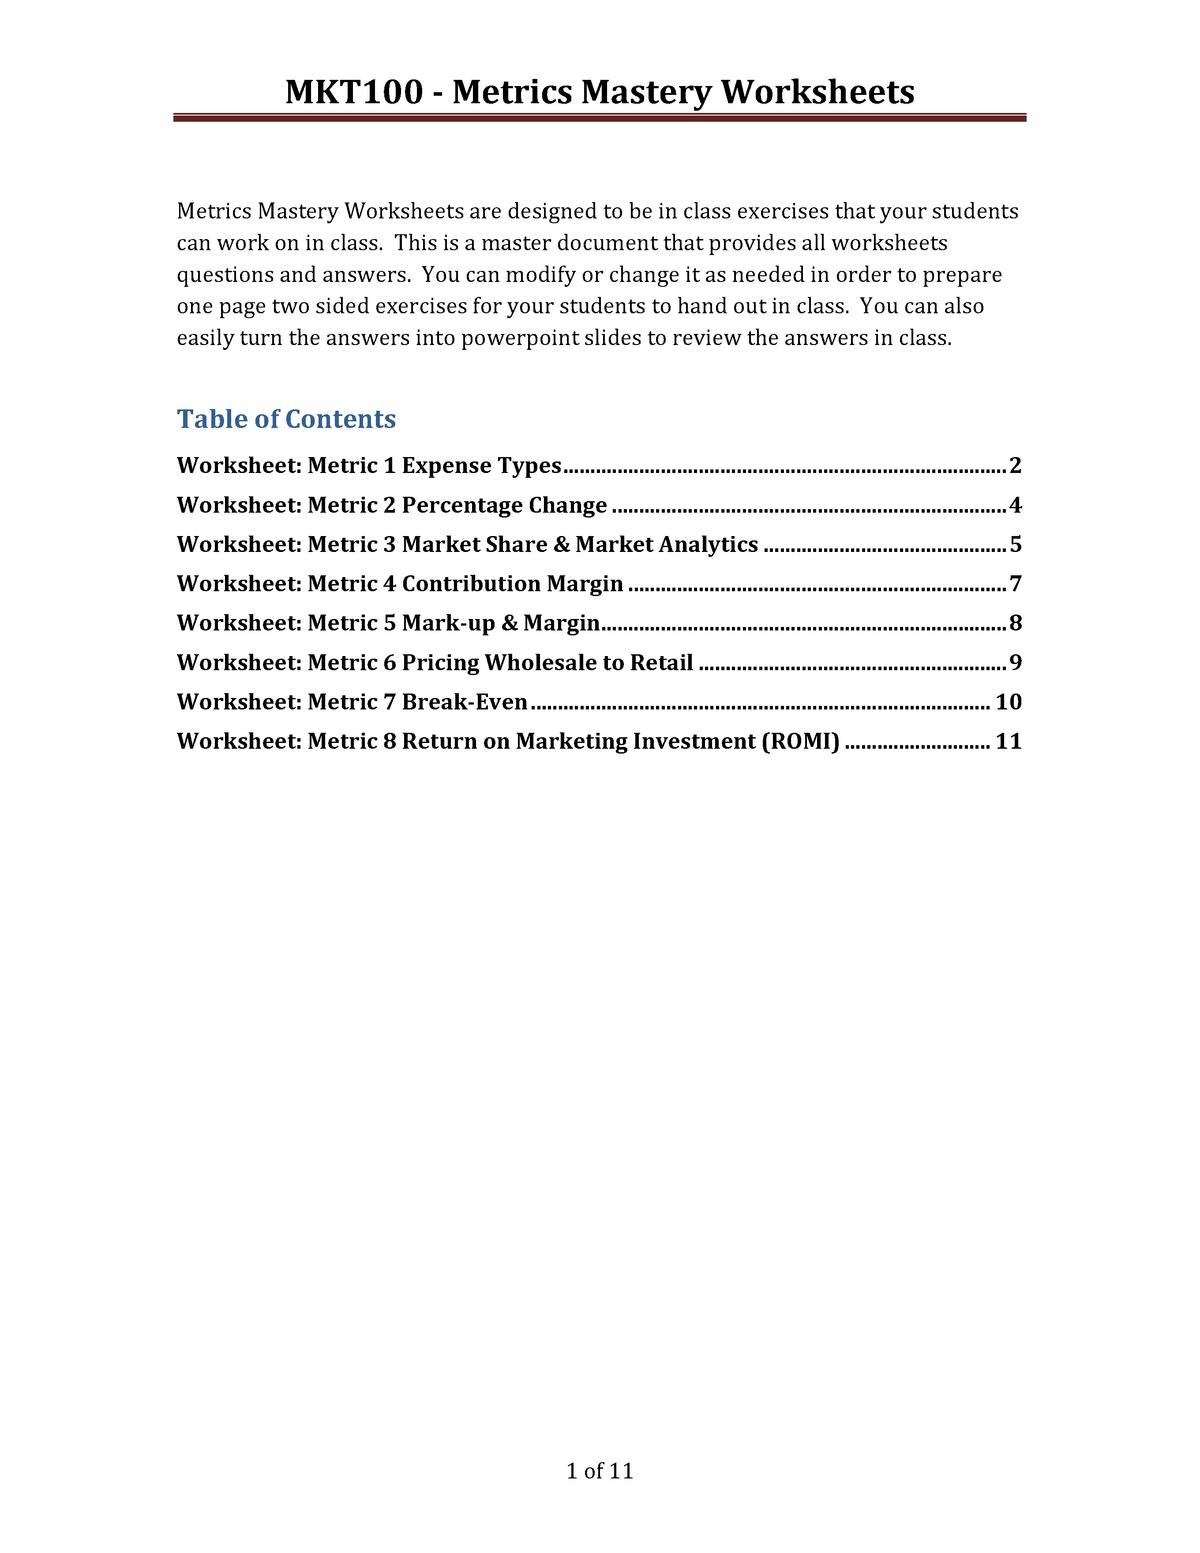 Practical - full metrics question sheet - Cmkt 100: Principles of